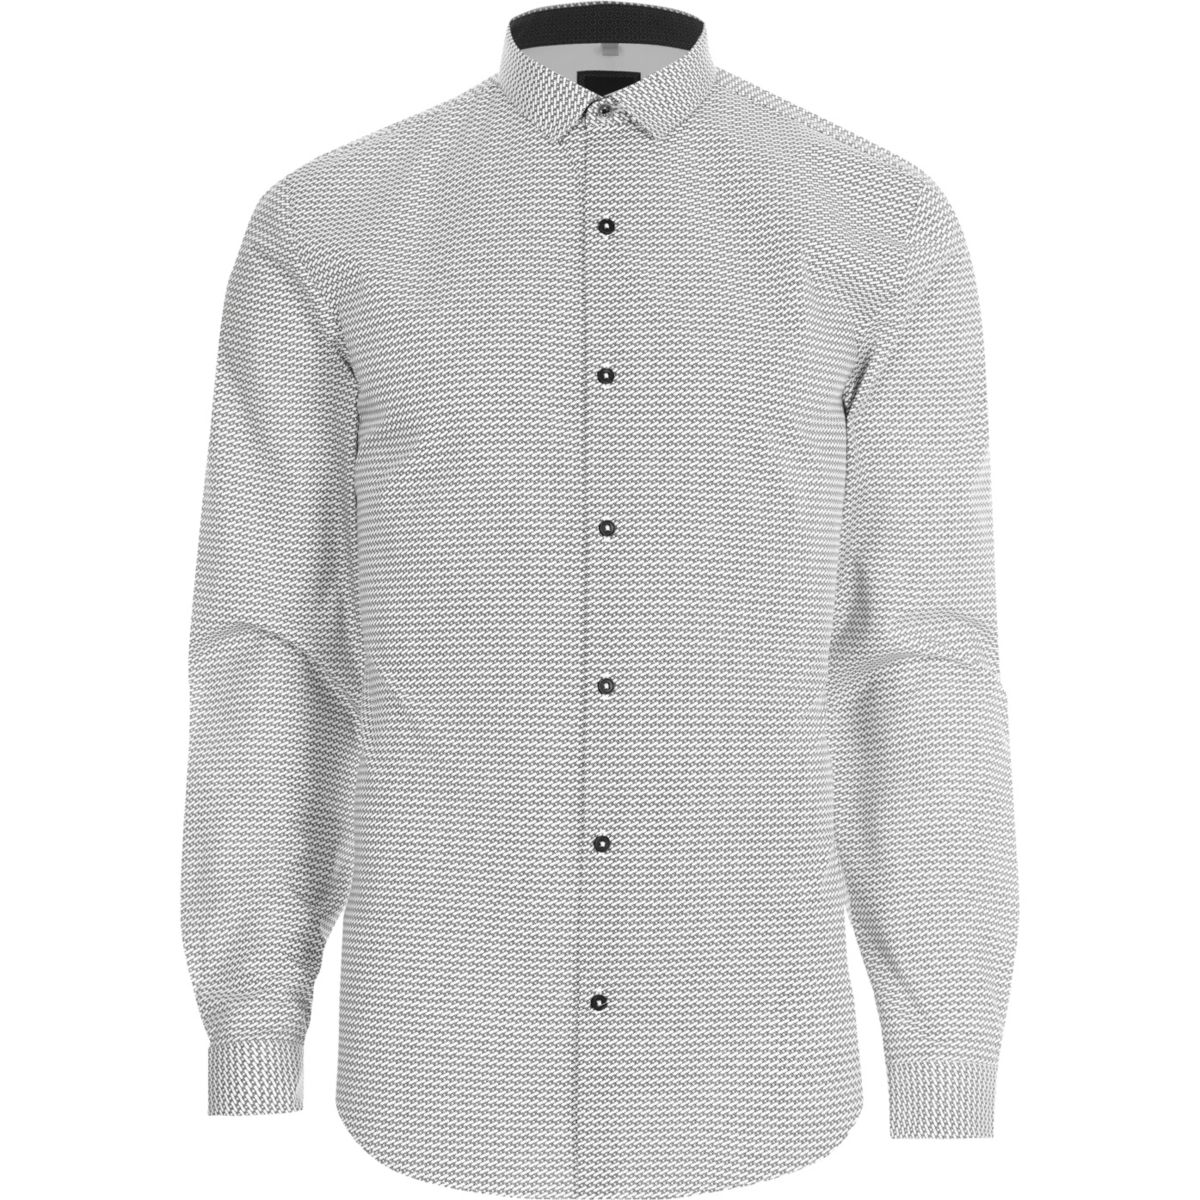 Zwart-wit slim-fit overhemd met geoprint